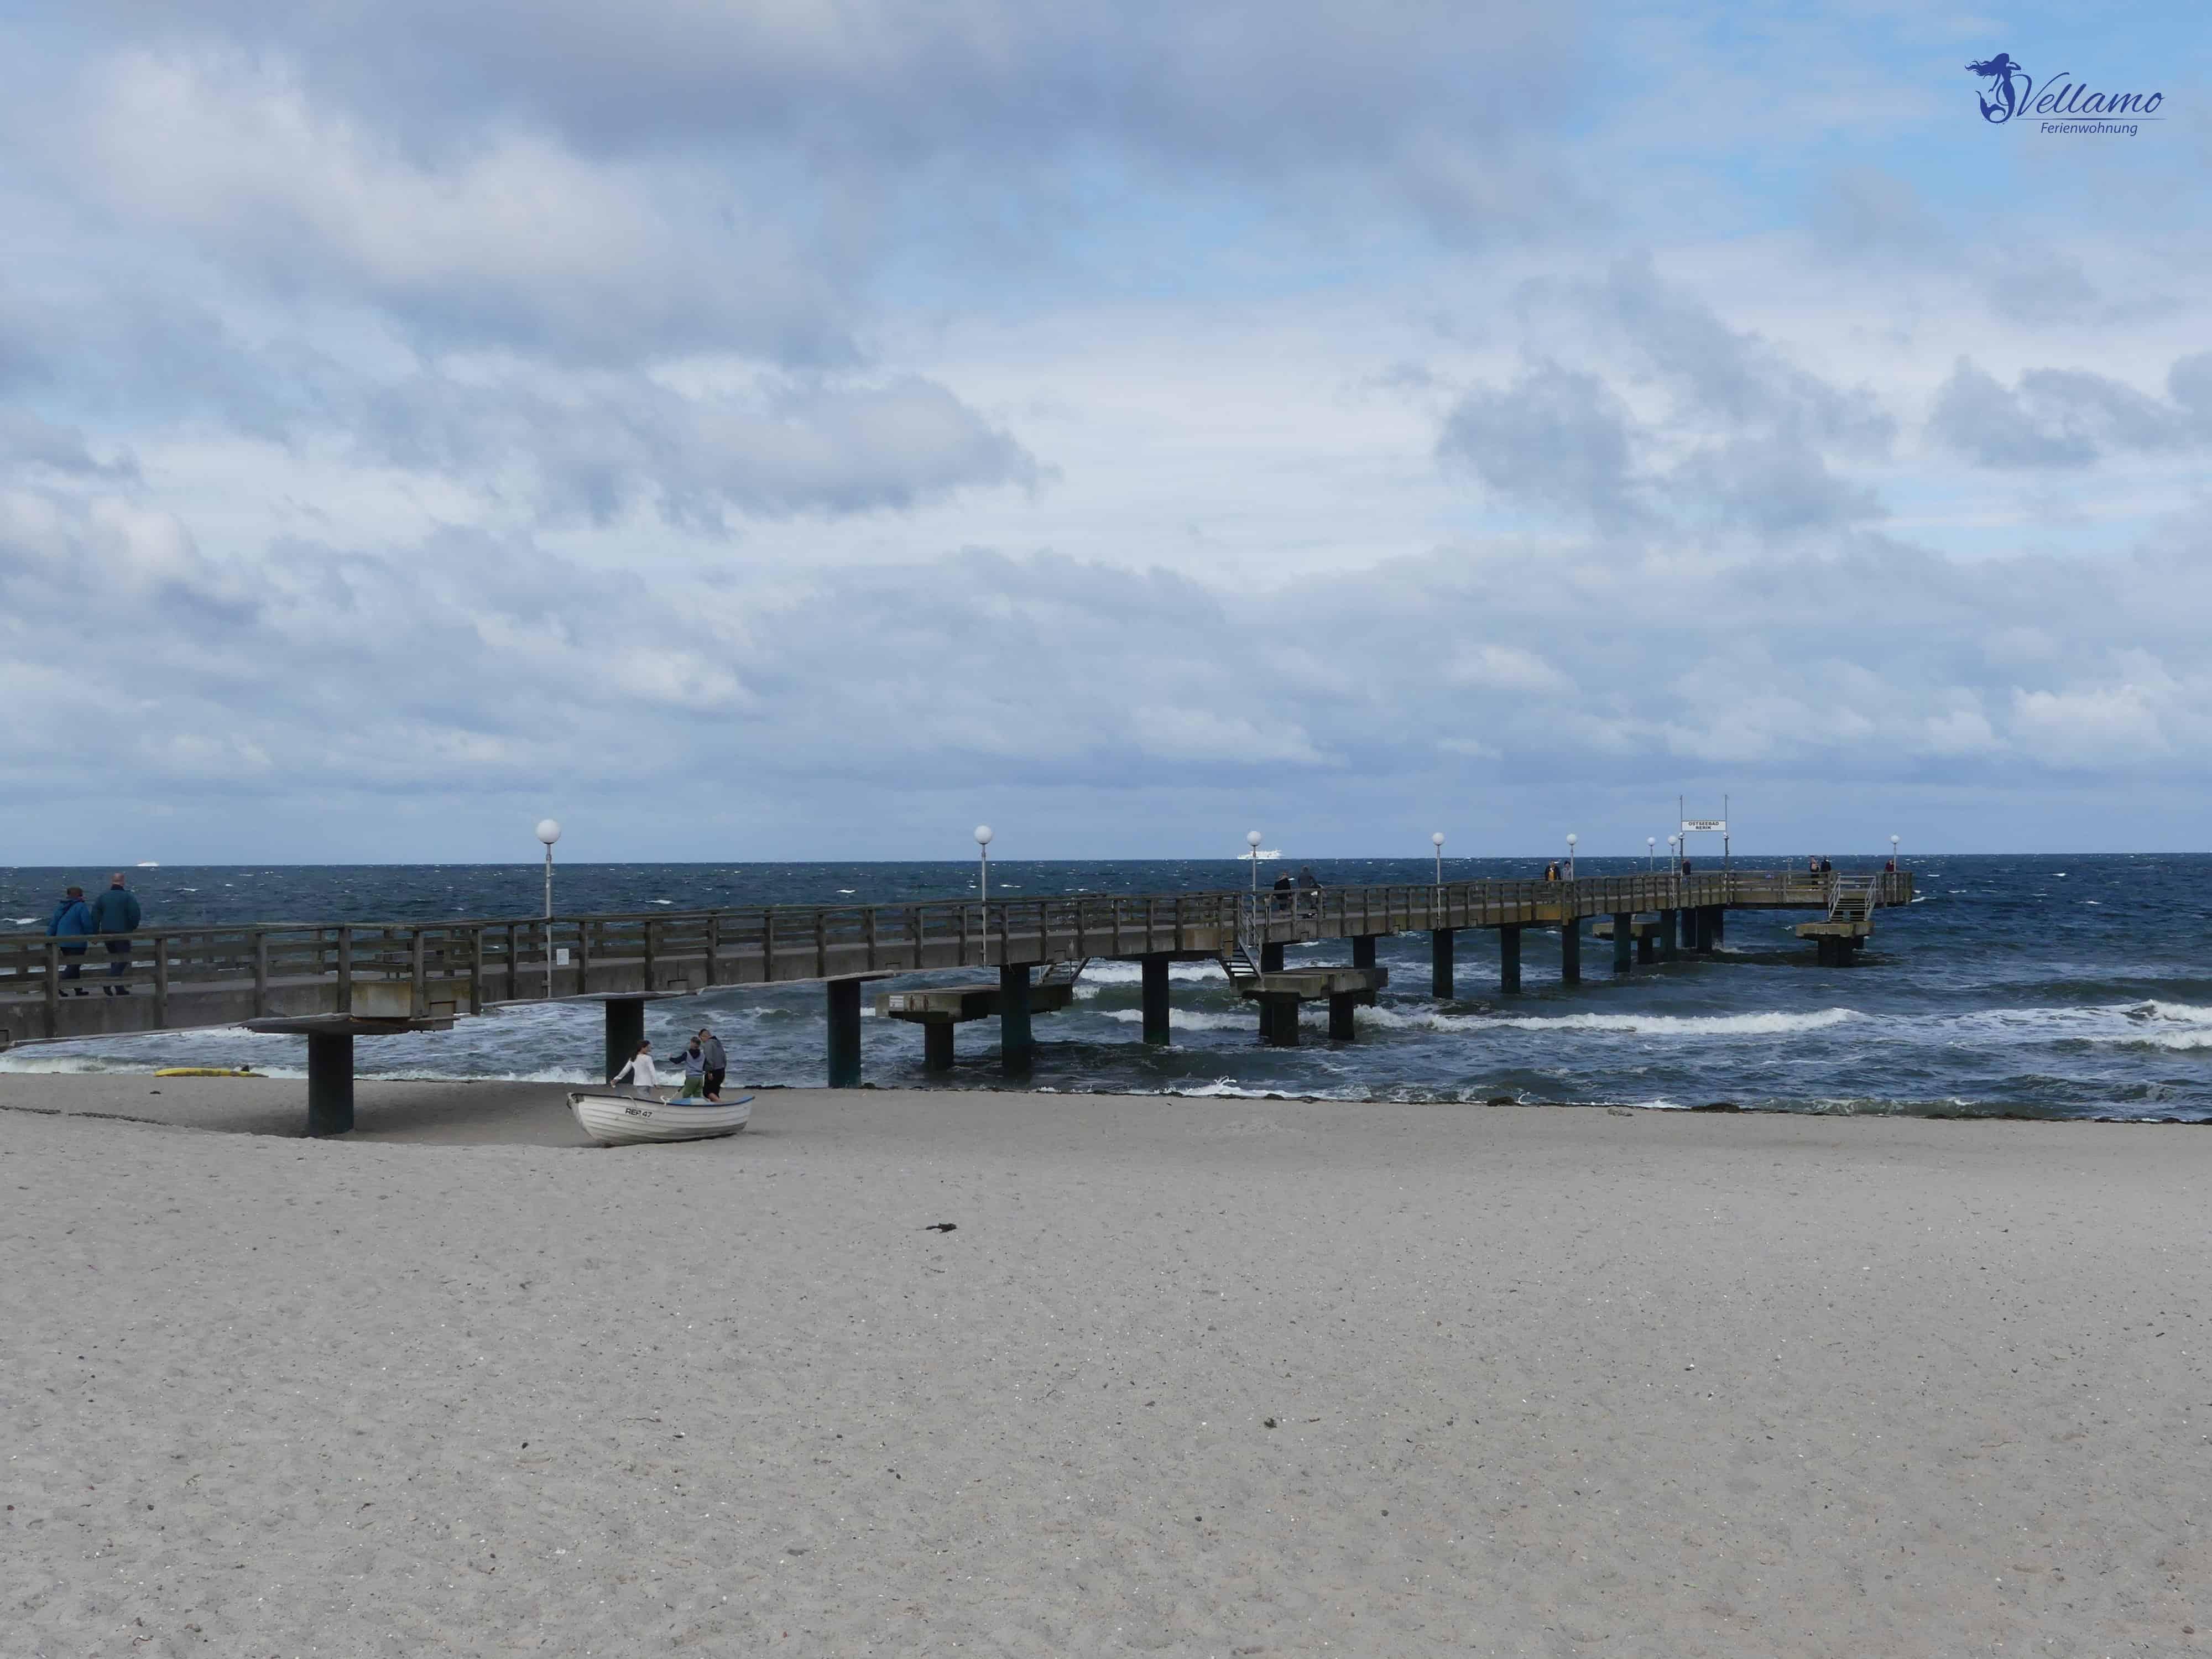 Impressionen Ostseebad Rerik - Seebrücke Rerik